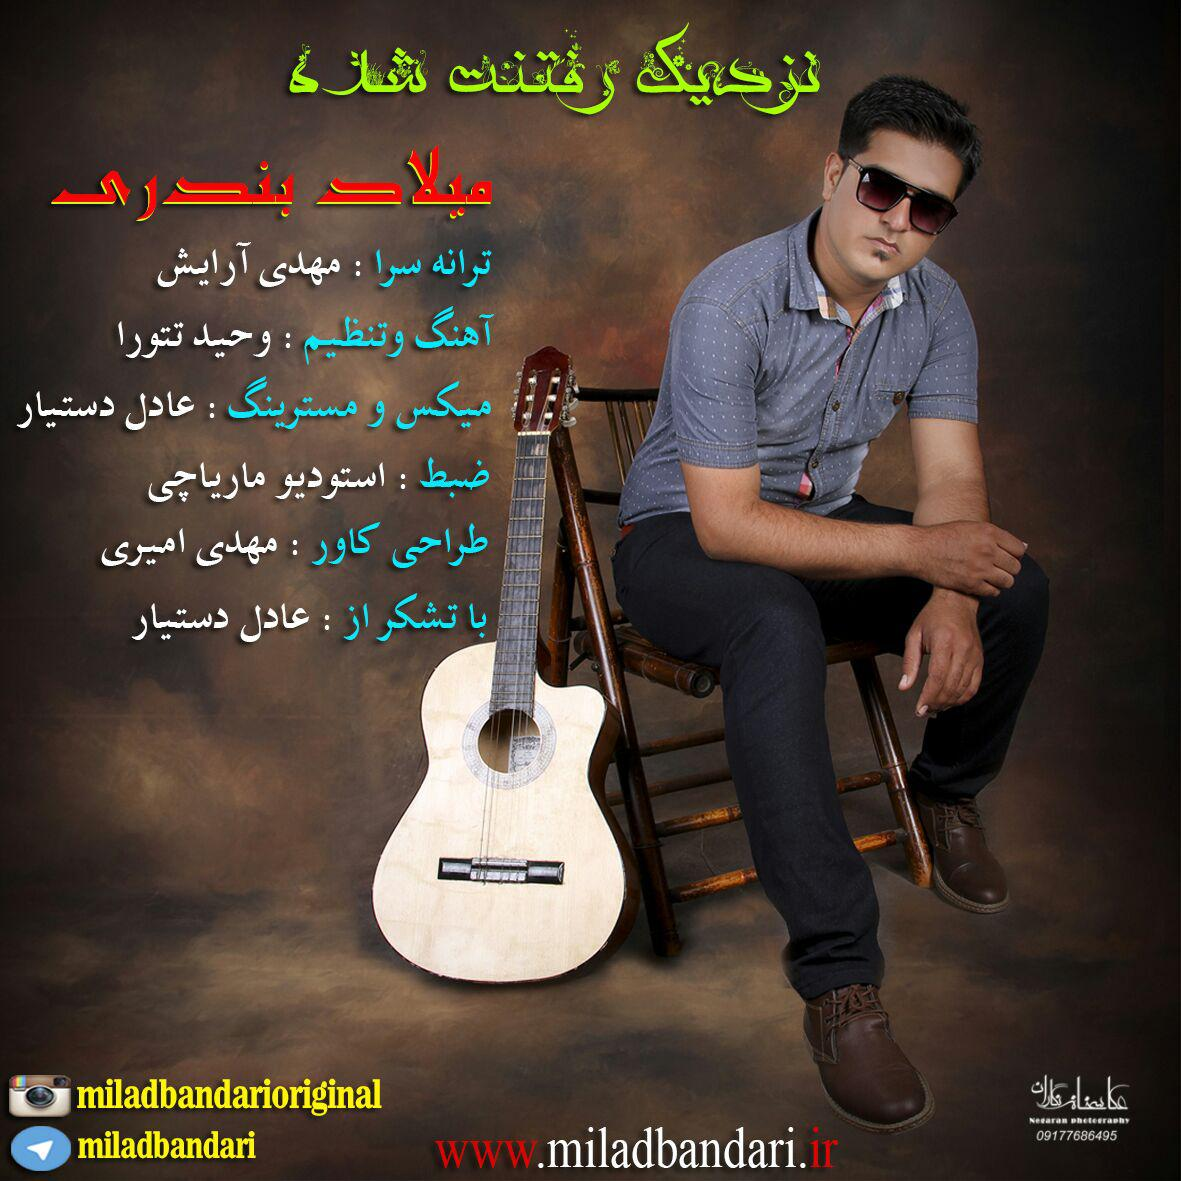 Milad Bandari-Nazdike Raftanet Shode